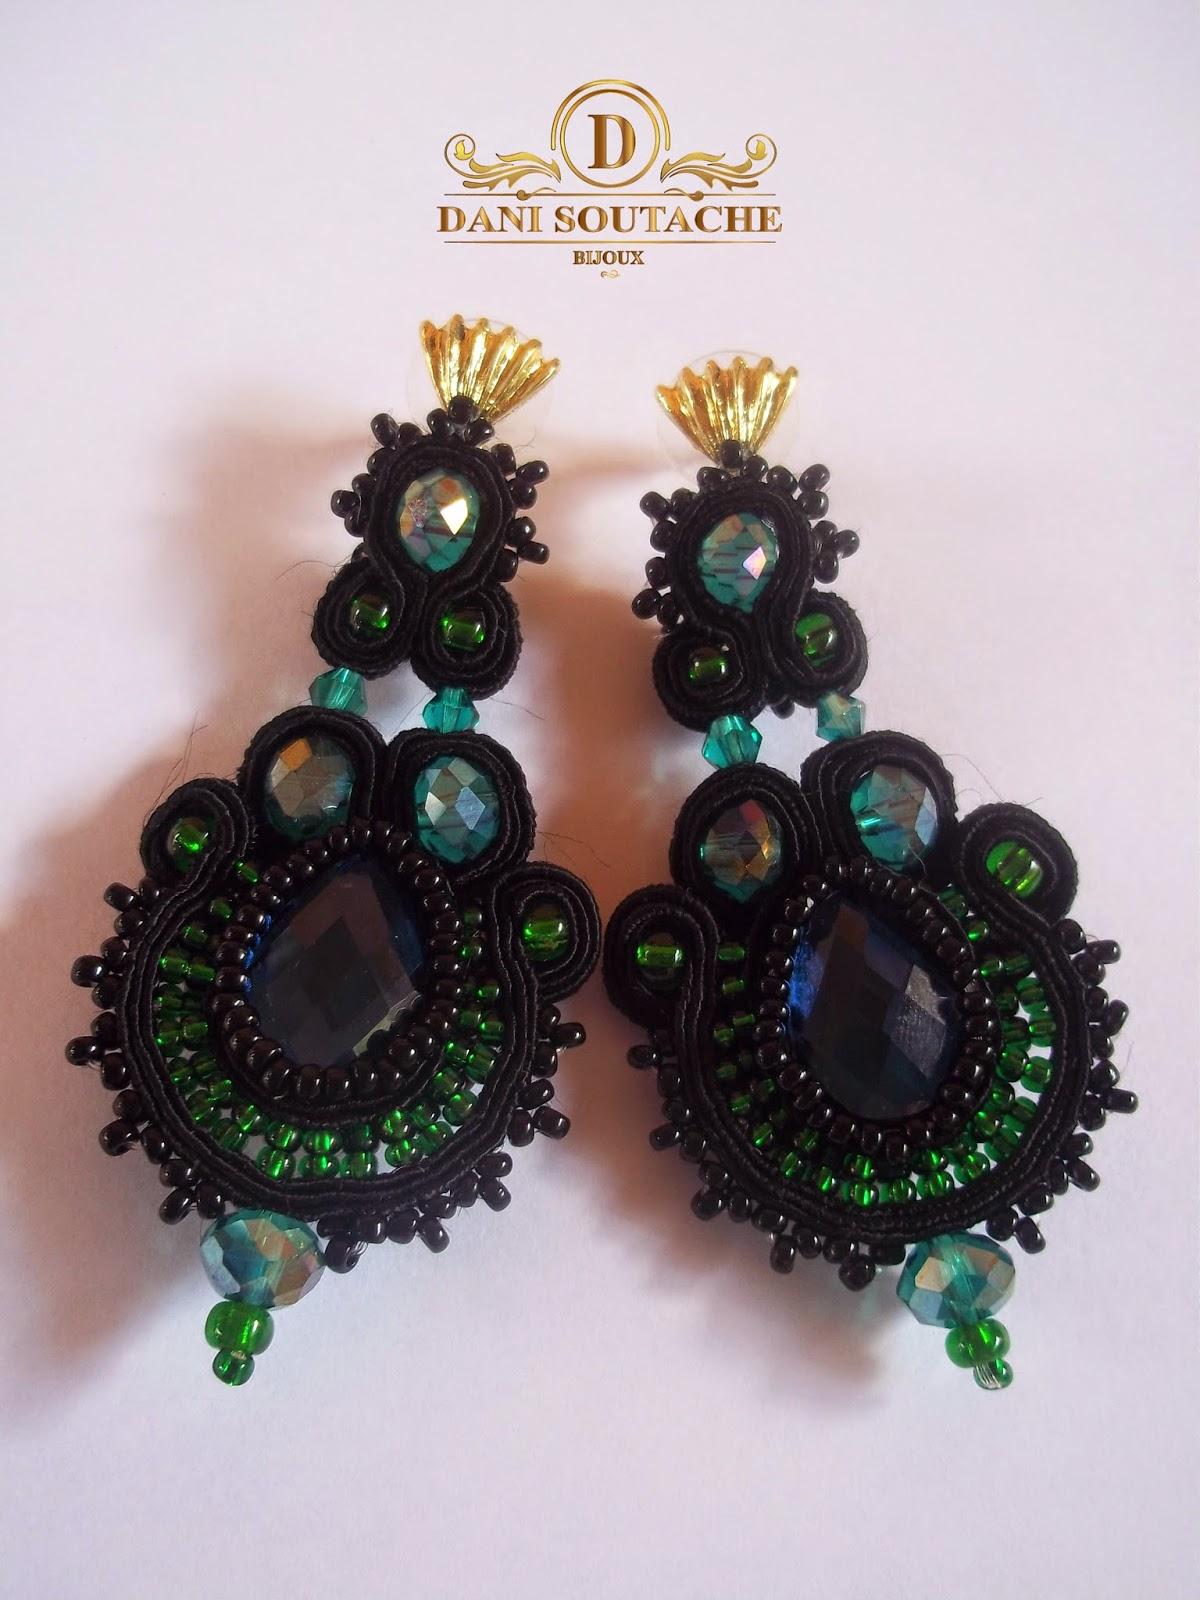 Brincos em soutache preto, miçangas verdes jablonex, cristais rondelle e pedra de vidro azul